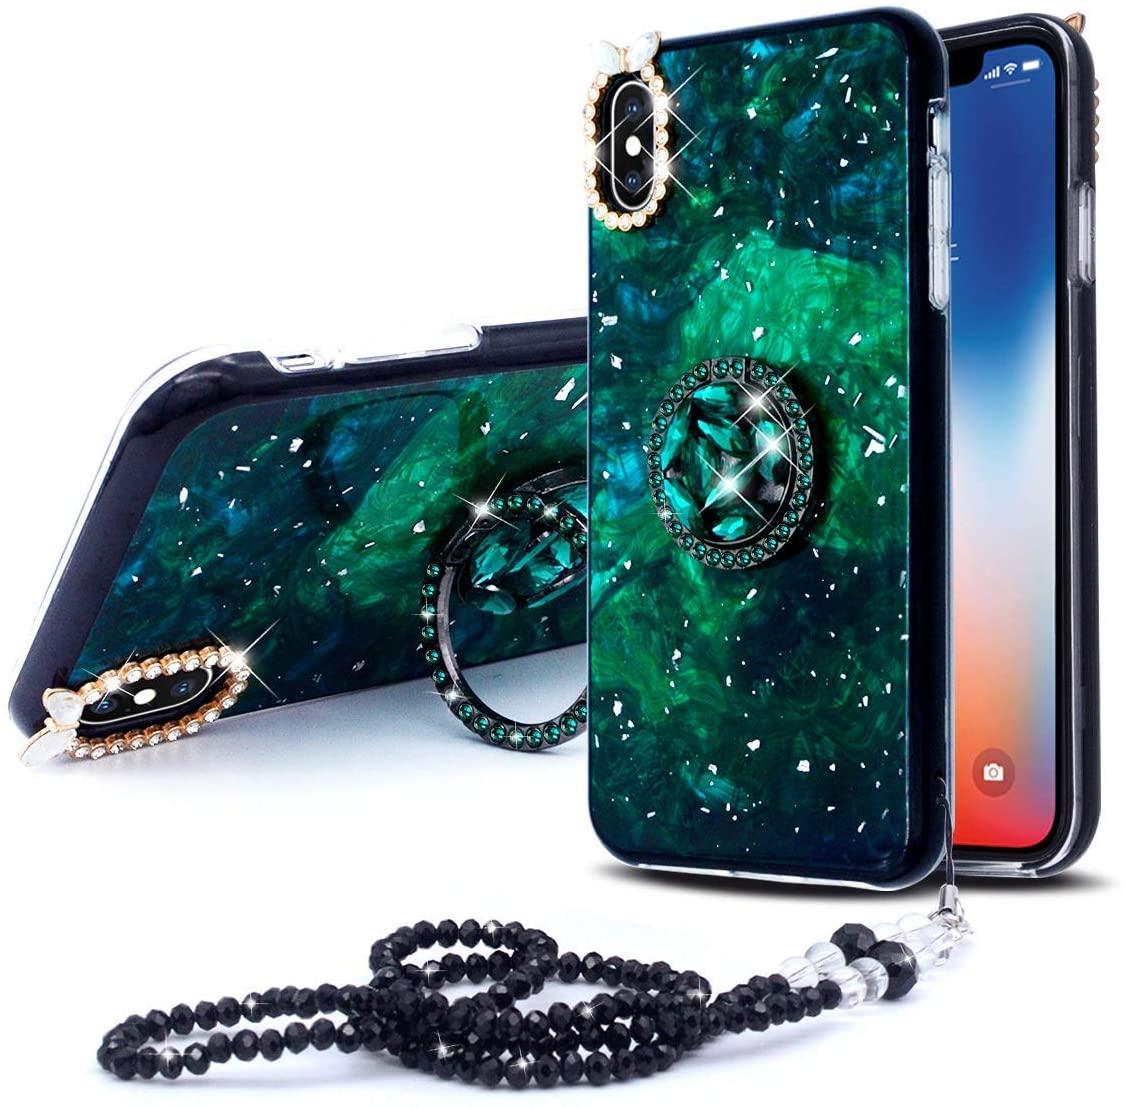 KJArrow Marble Case for iPhone 8Plus, Luxury Case for iPhone 7Plus (Green, iPhone 7P/8P)